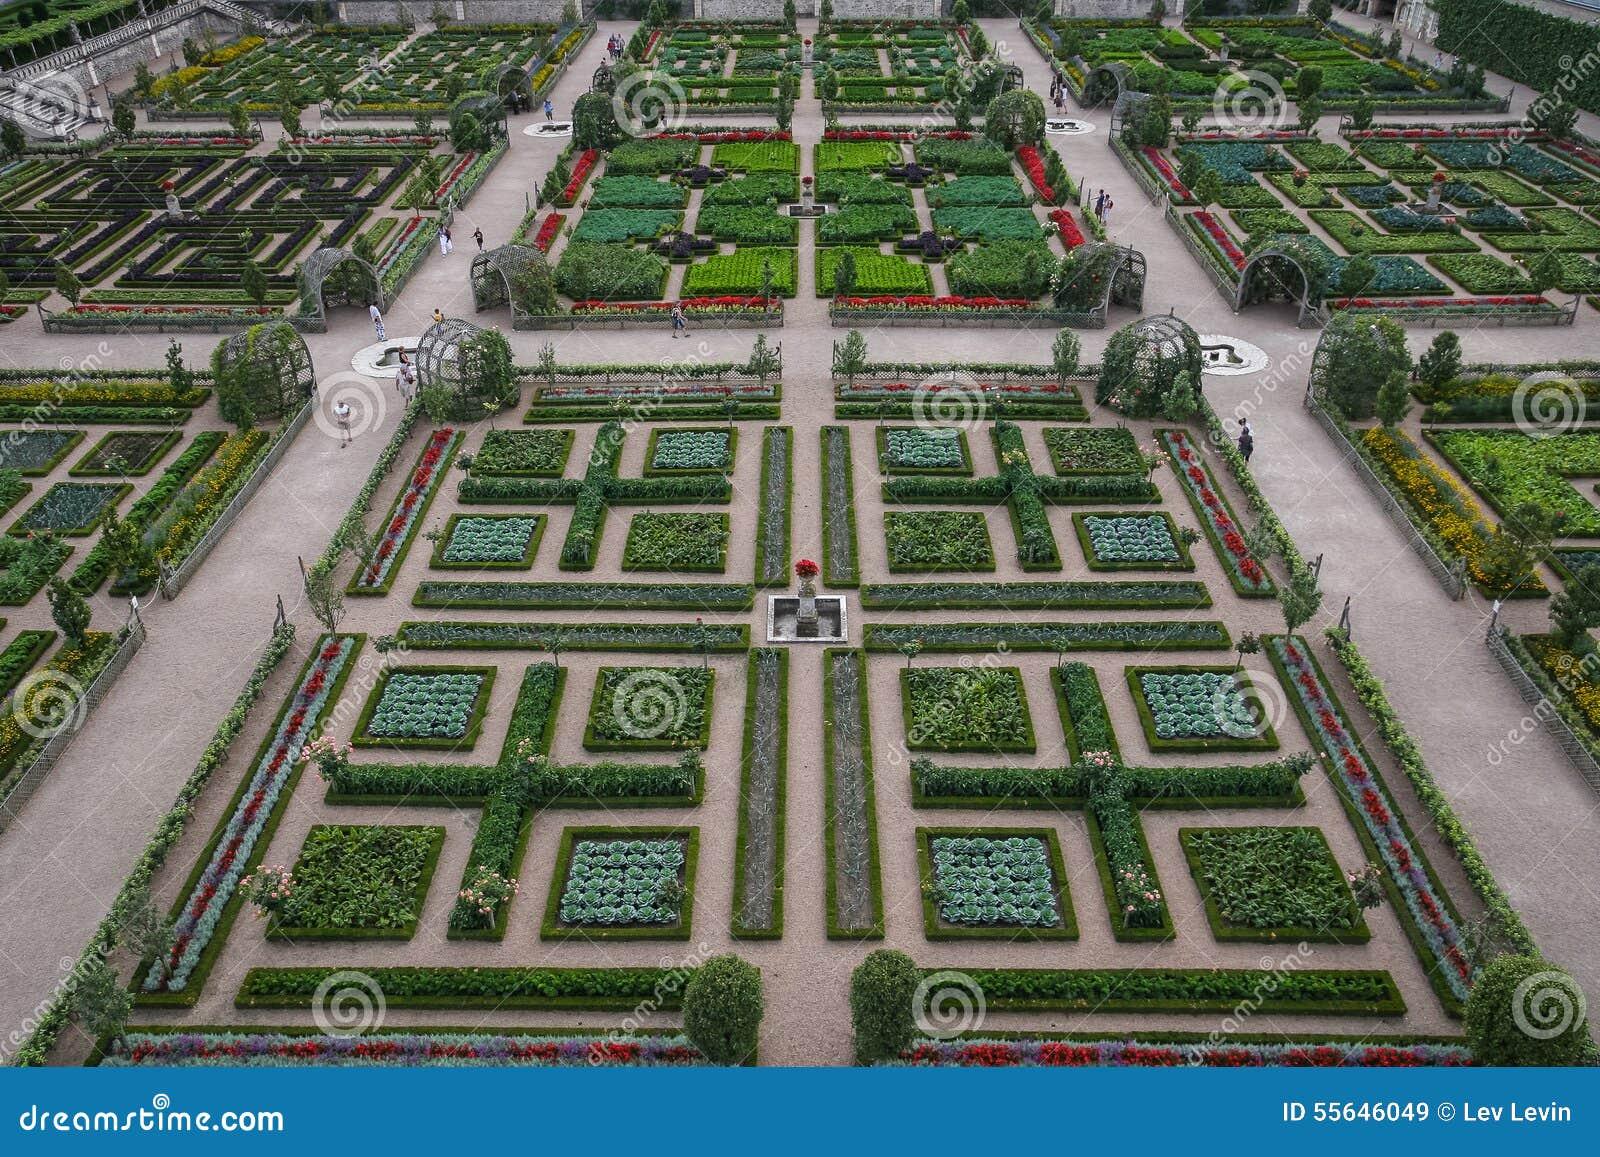 Garden Of Chateau De Villandry France Stock Image Image Of